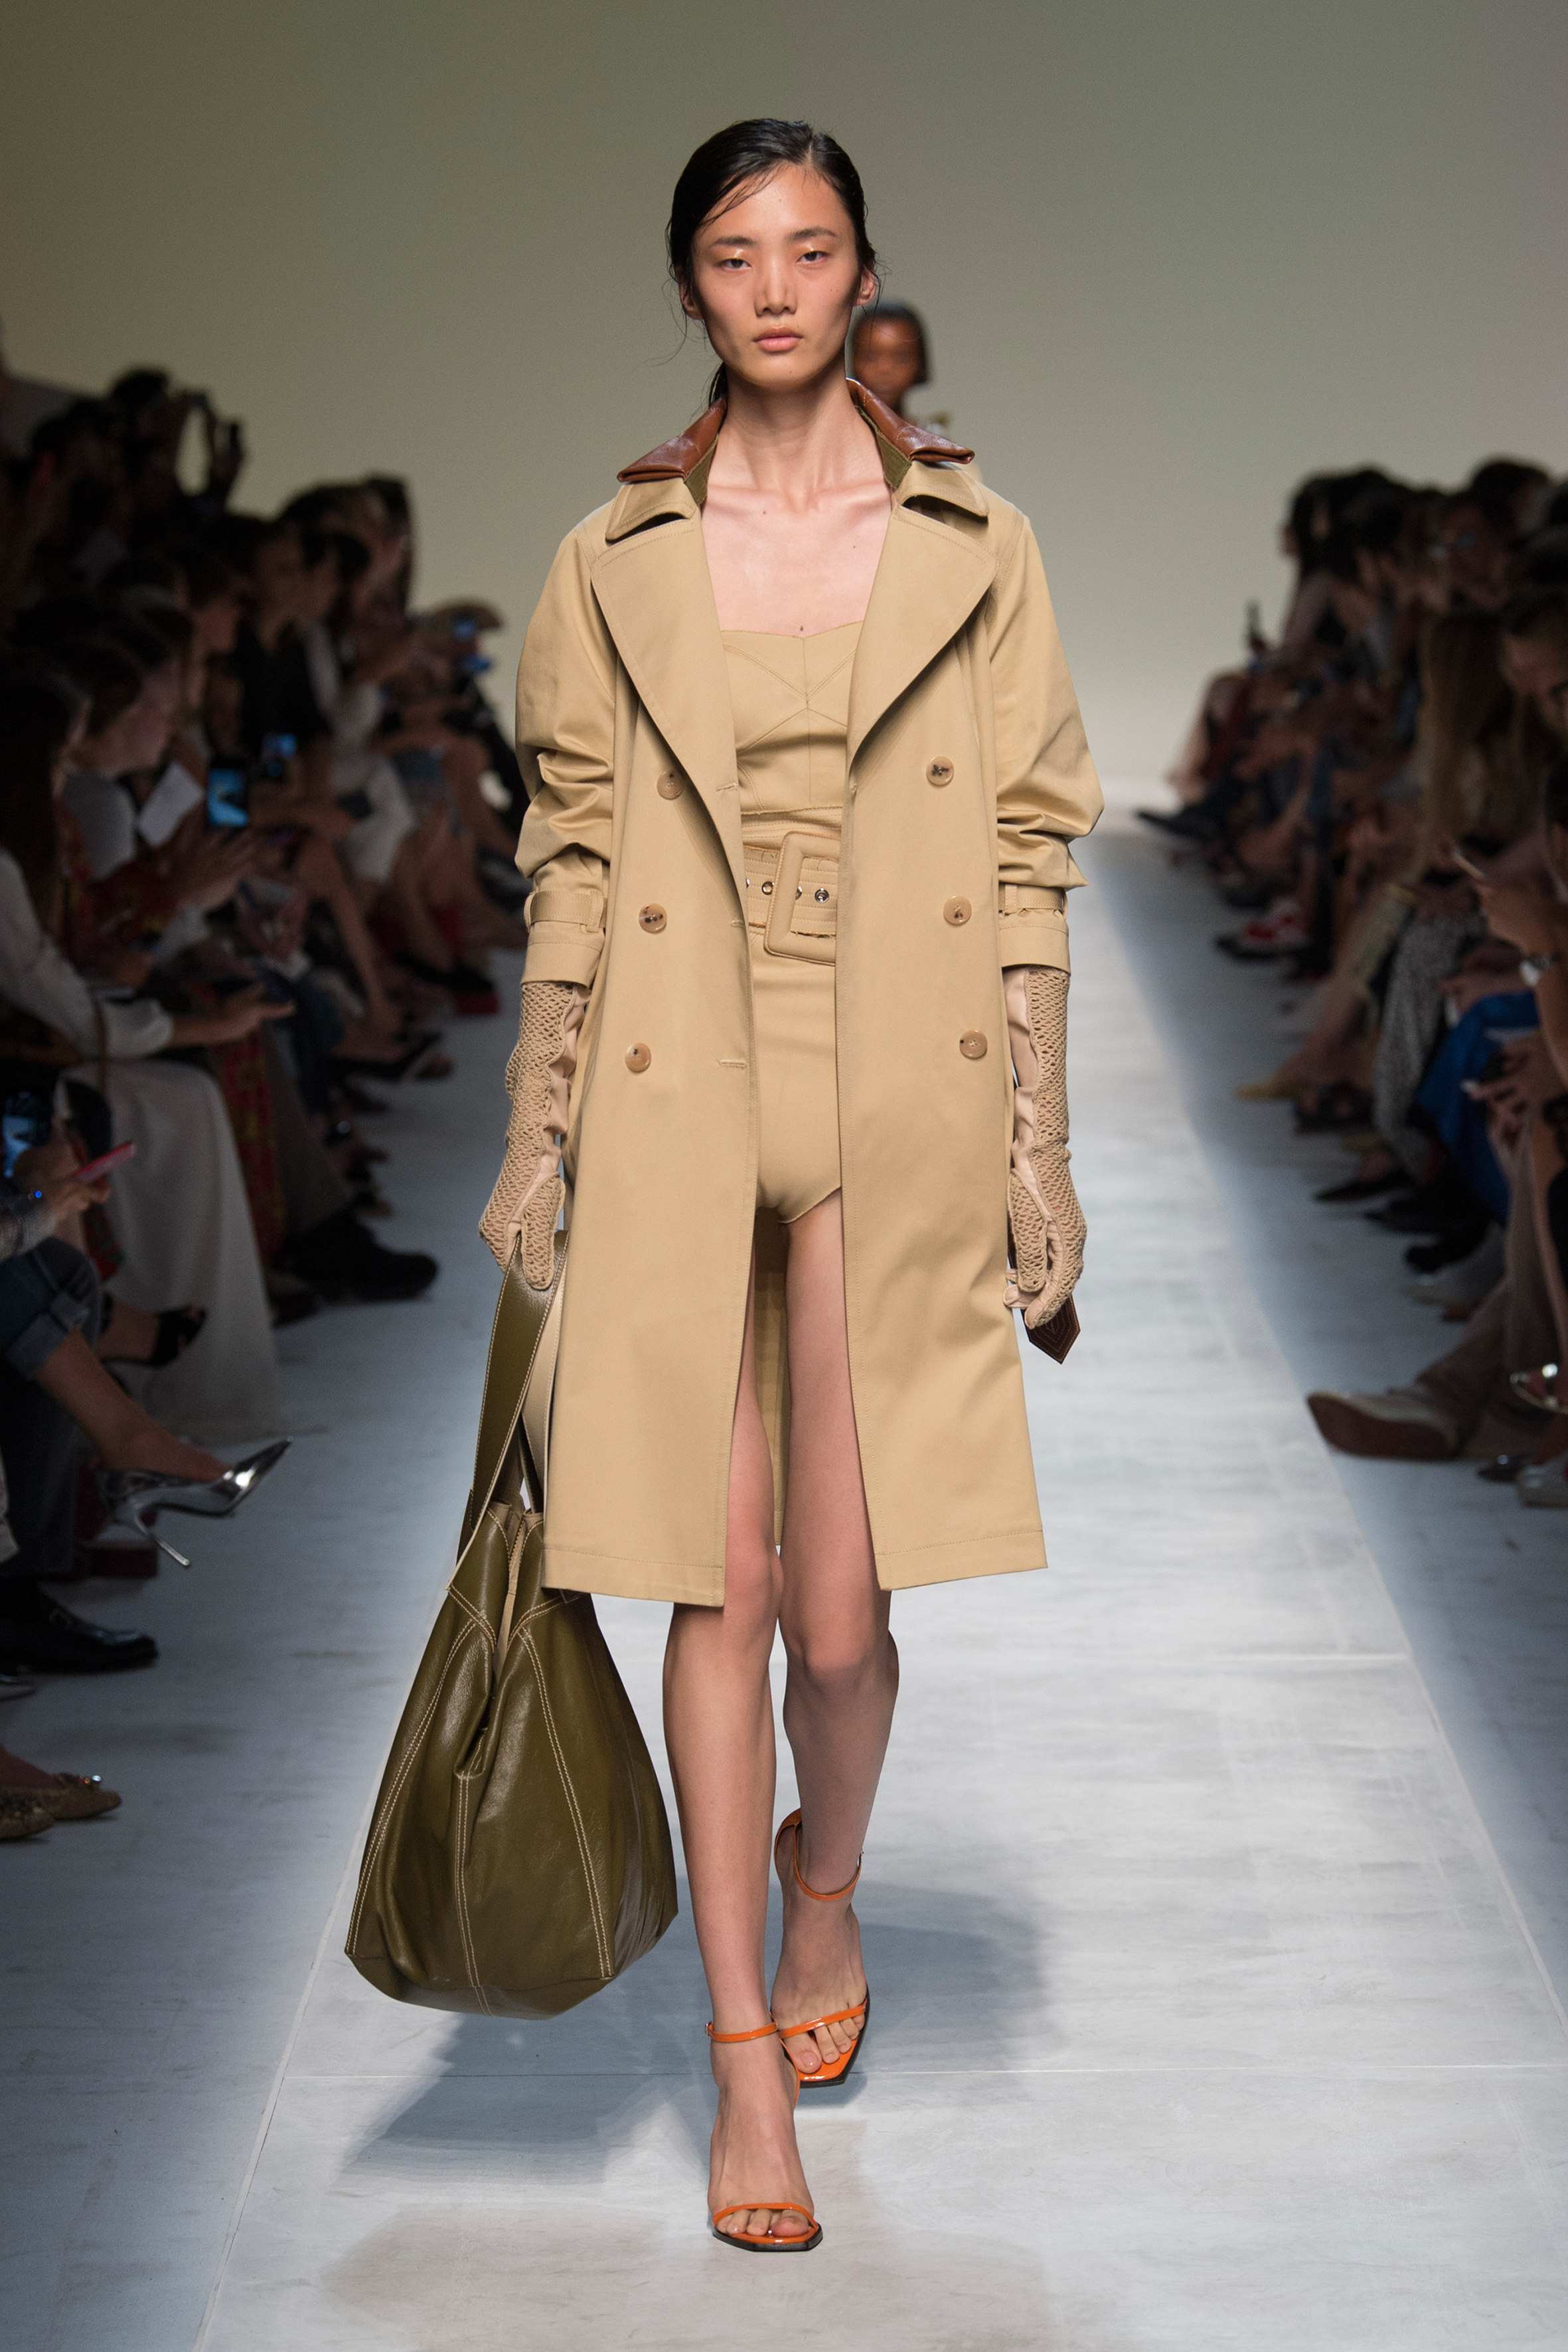 Modecollectie Ermanno Scervino lente zomer 2019